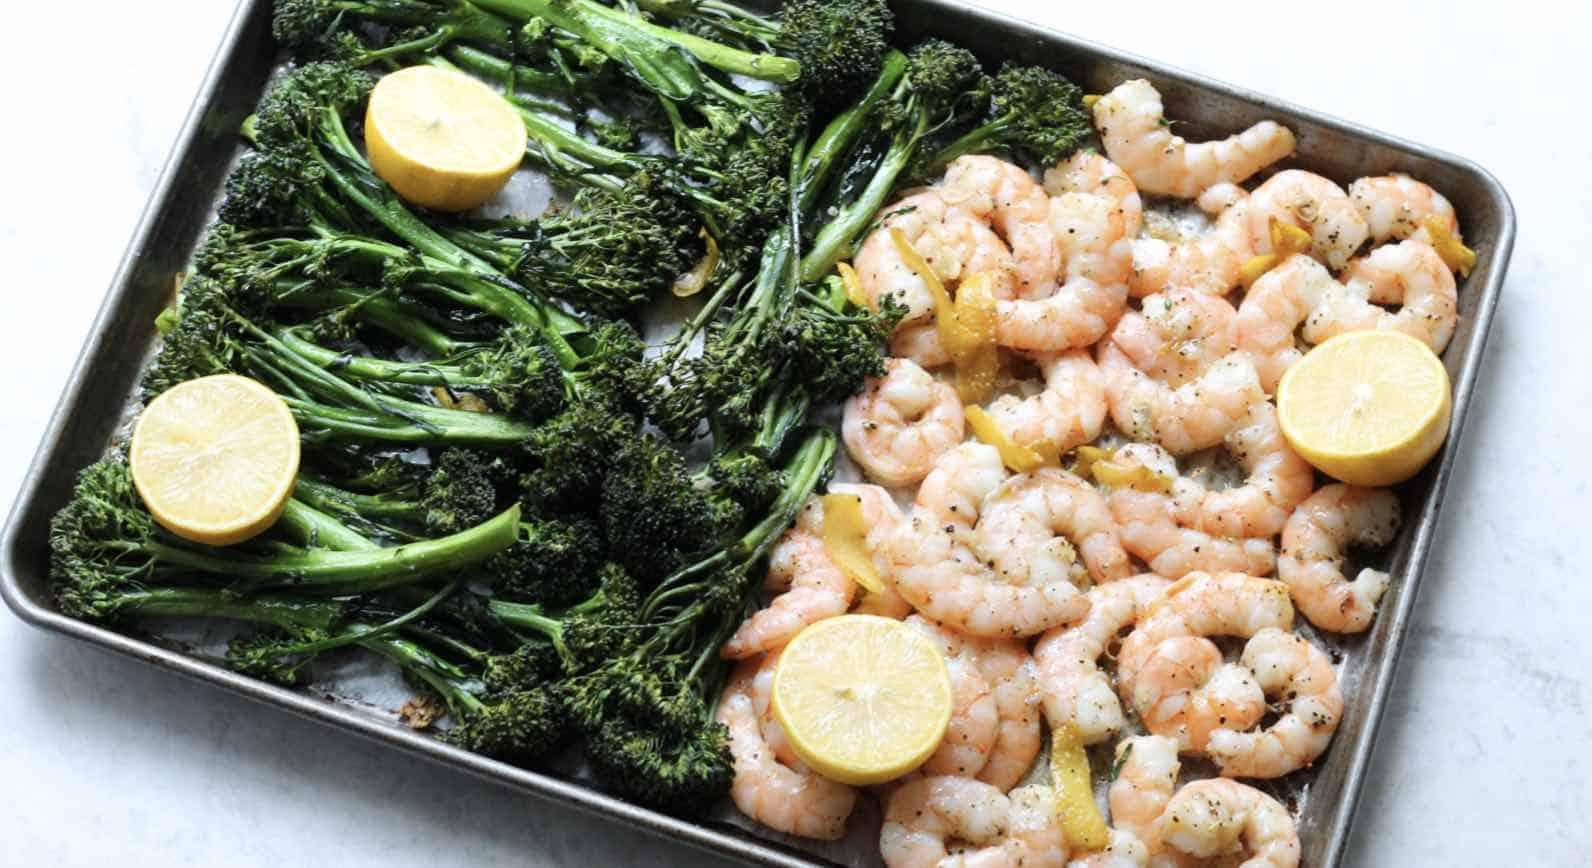 Sheet pan Roasted shrimp and broccolini